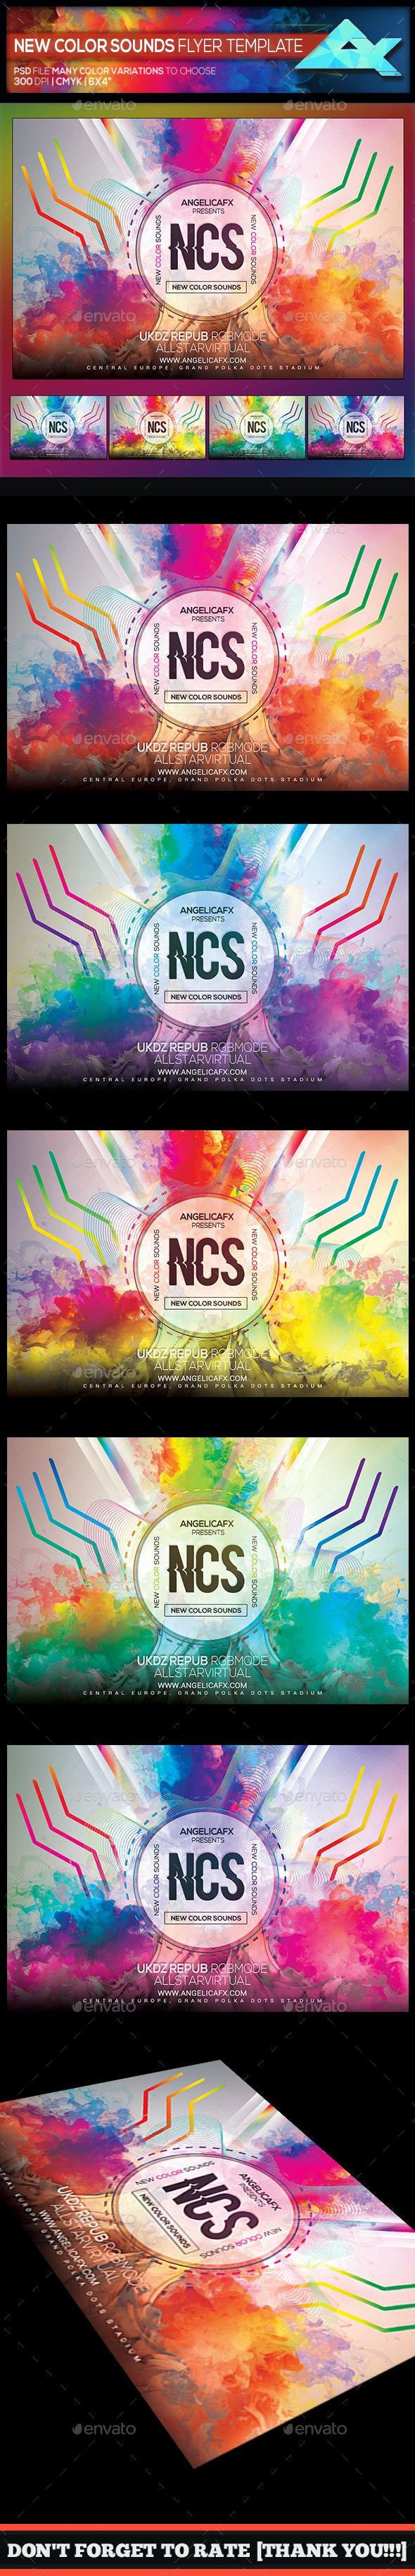 NCS New Color Sounds Photoshop Flyer Template - Events Flyers